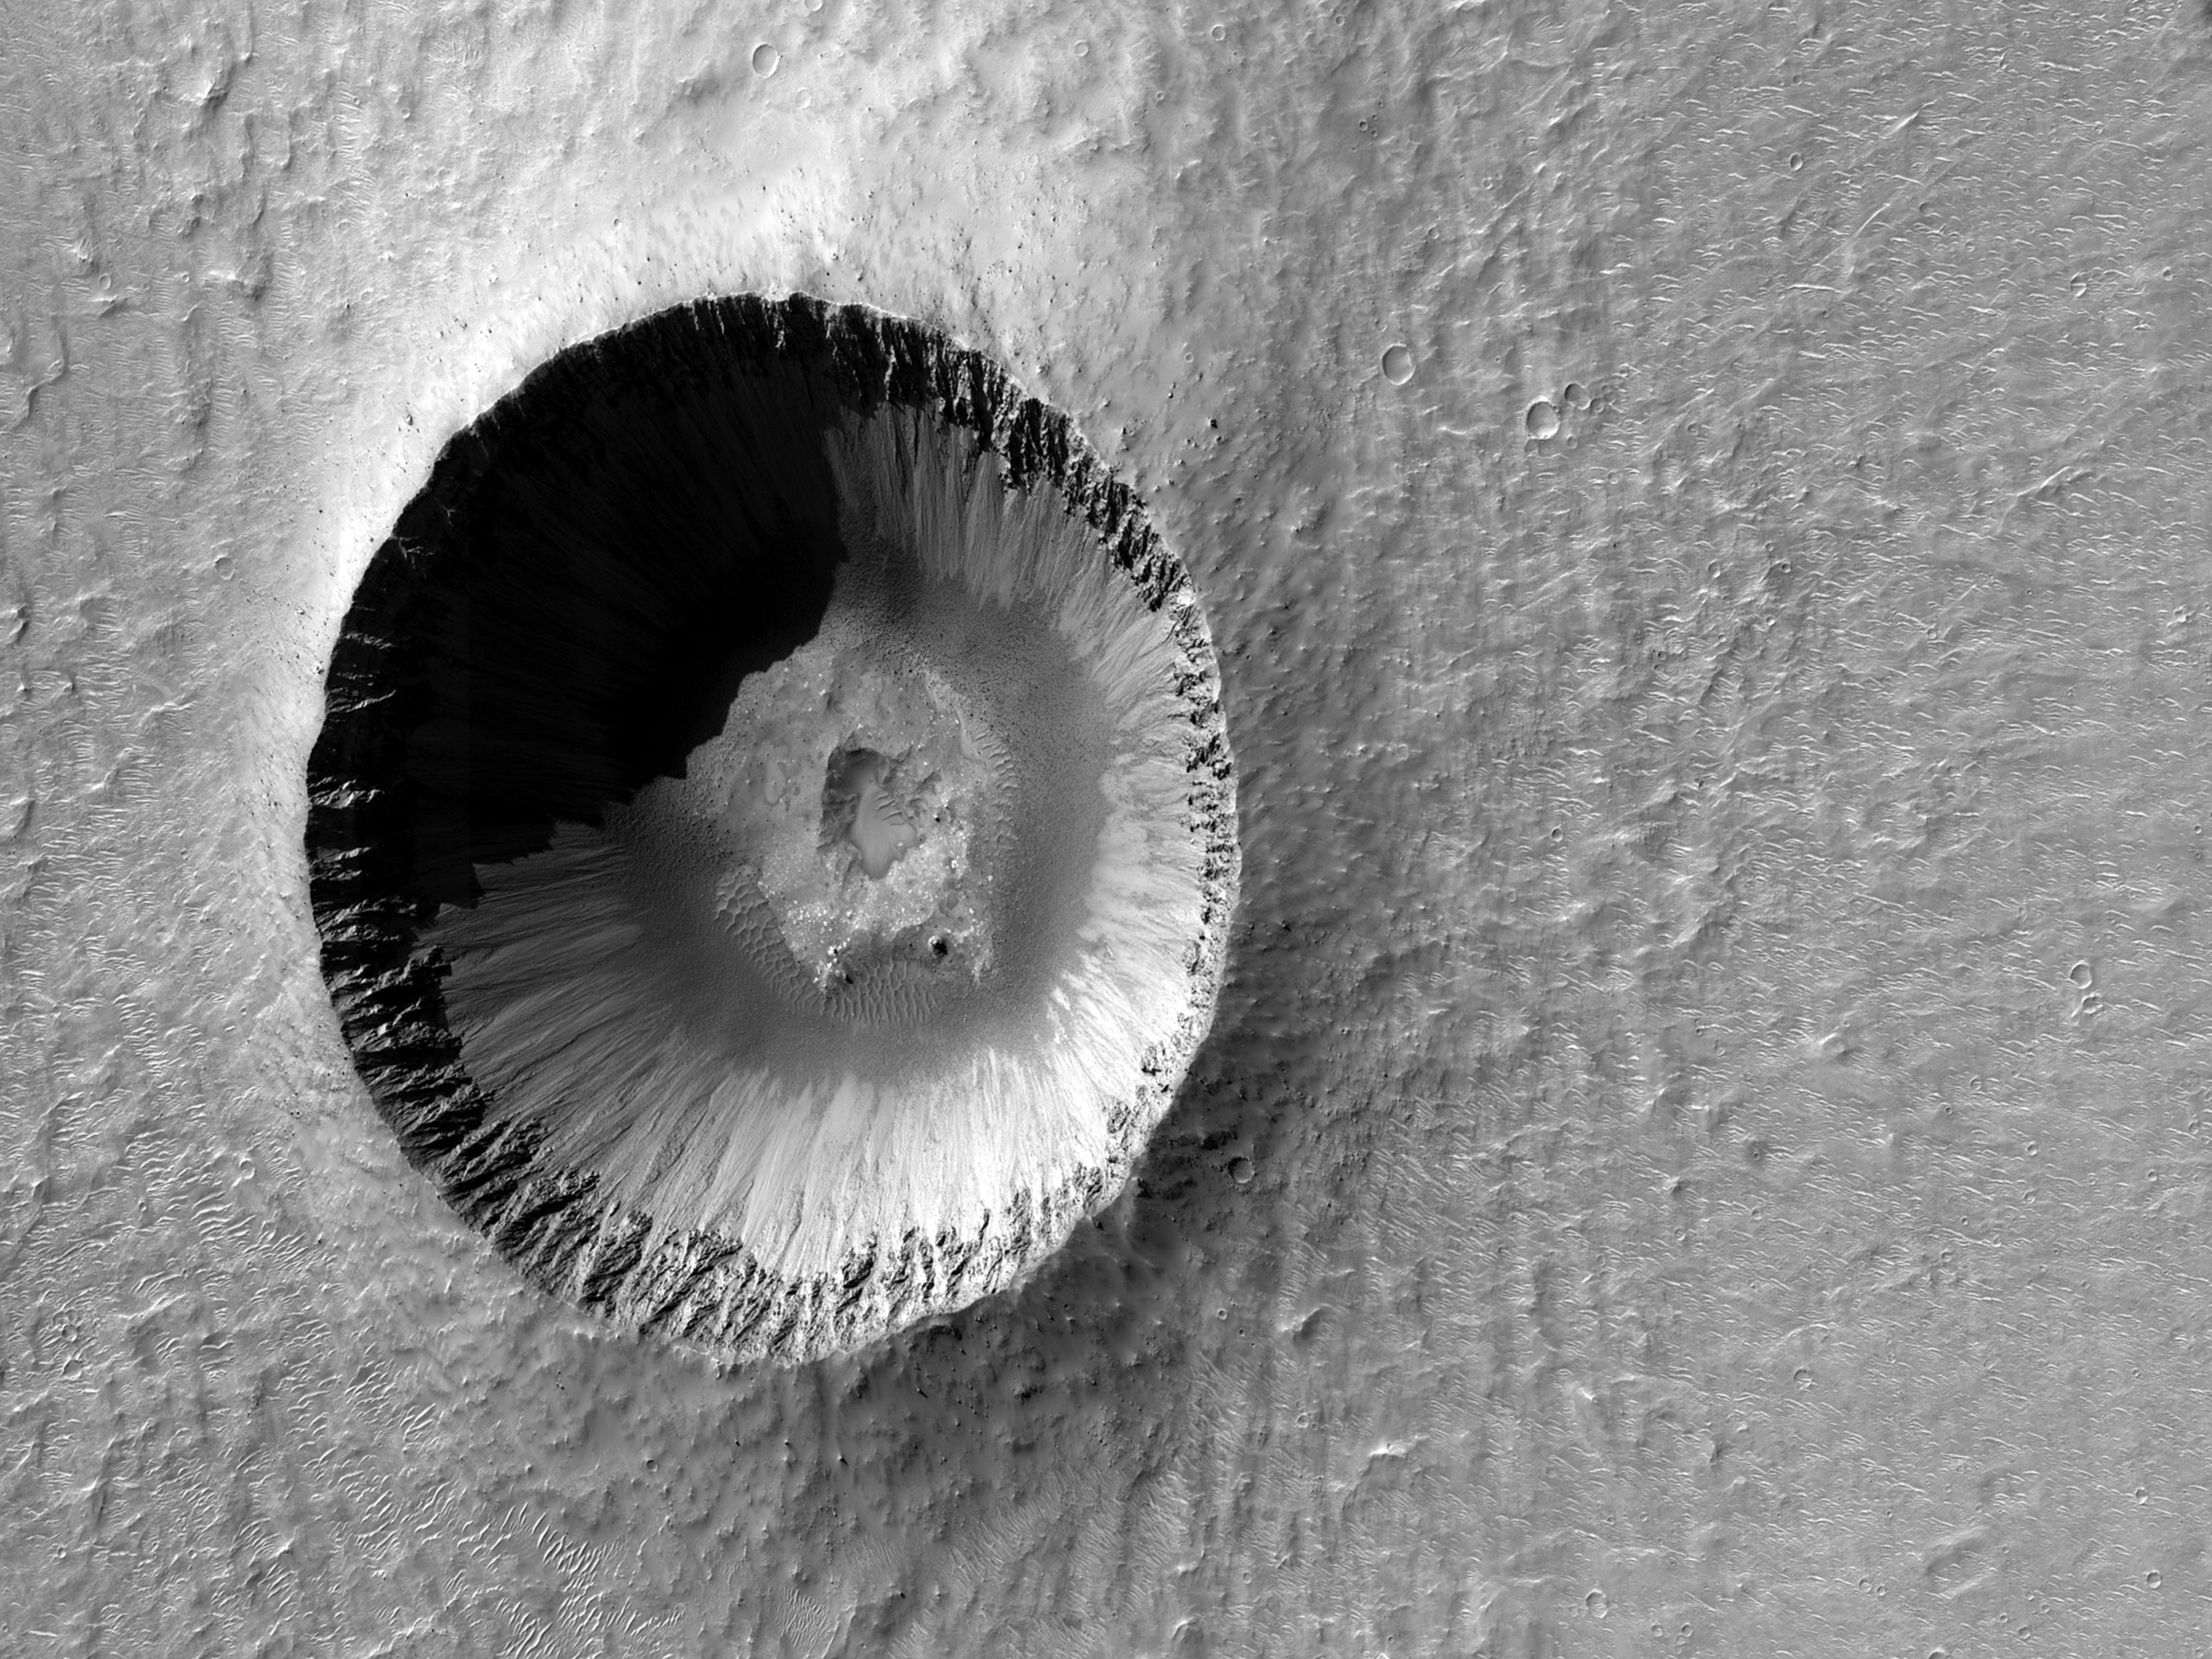 Cratere ben conservato in Margaritifer Terra